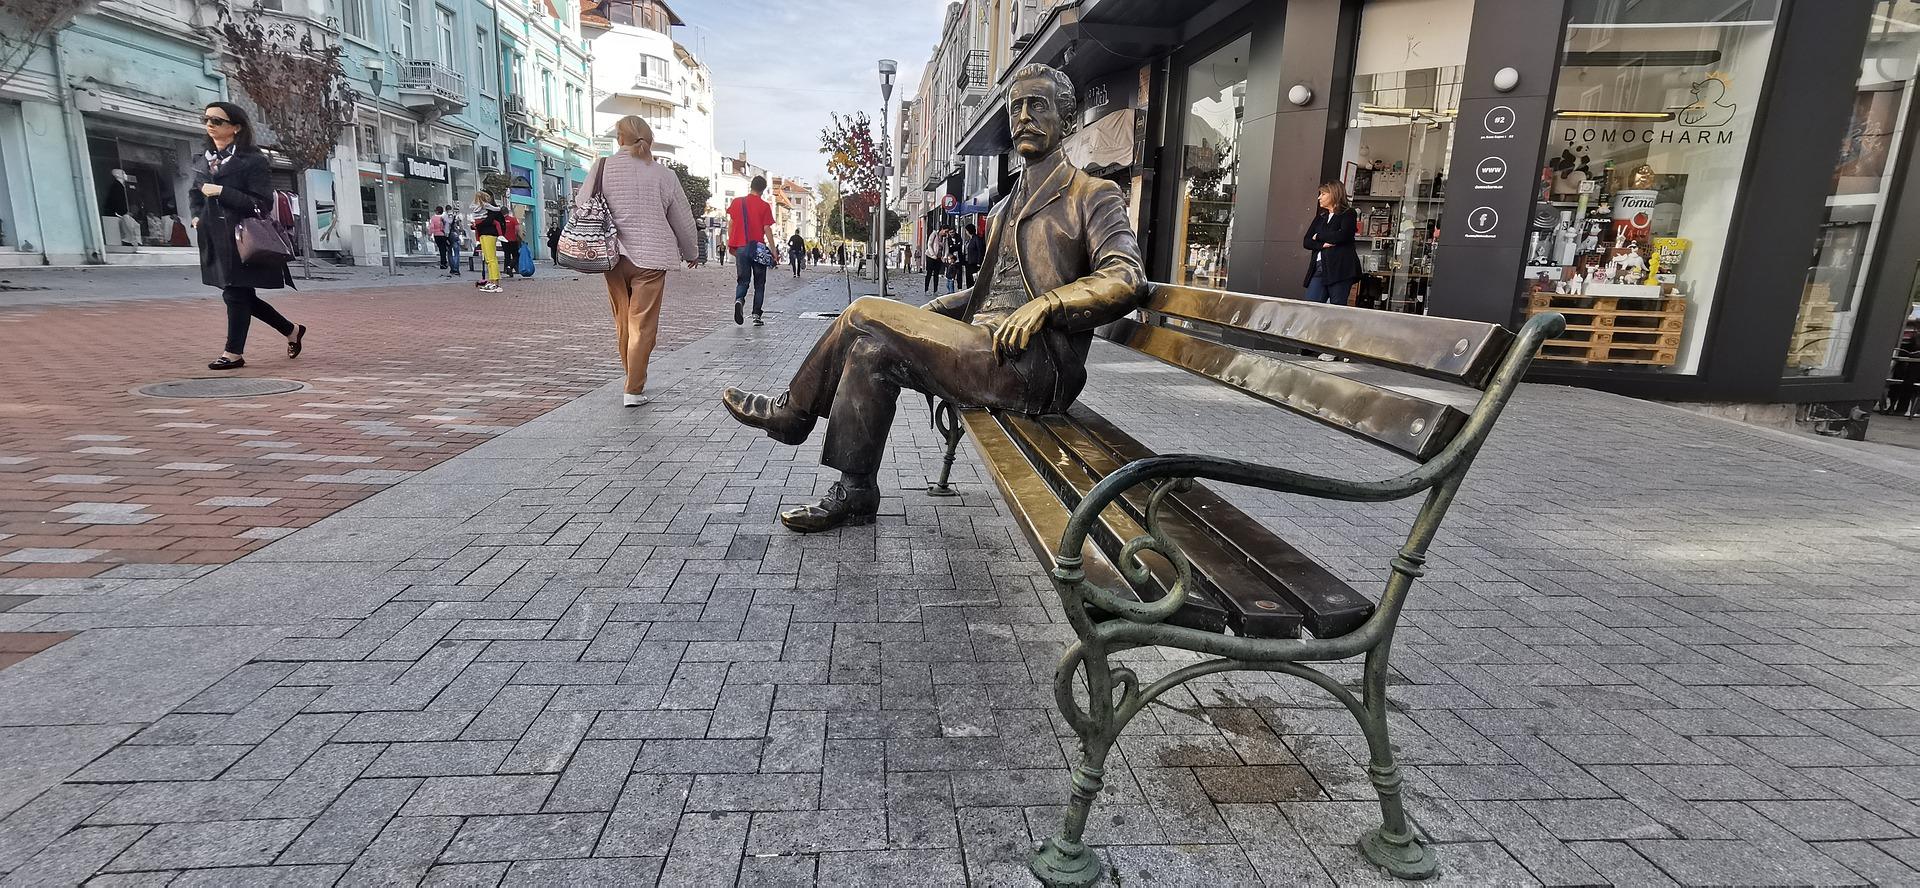 Varna town